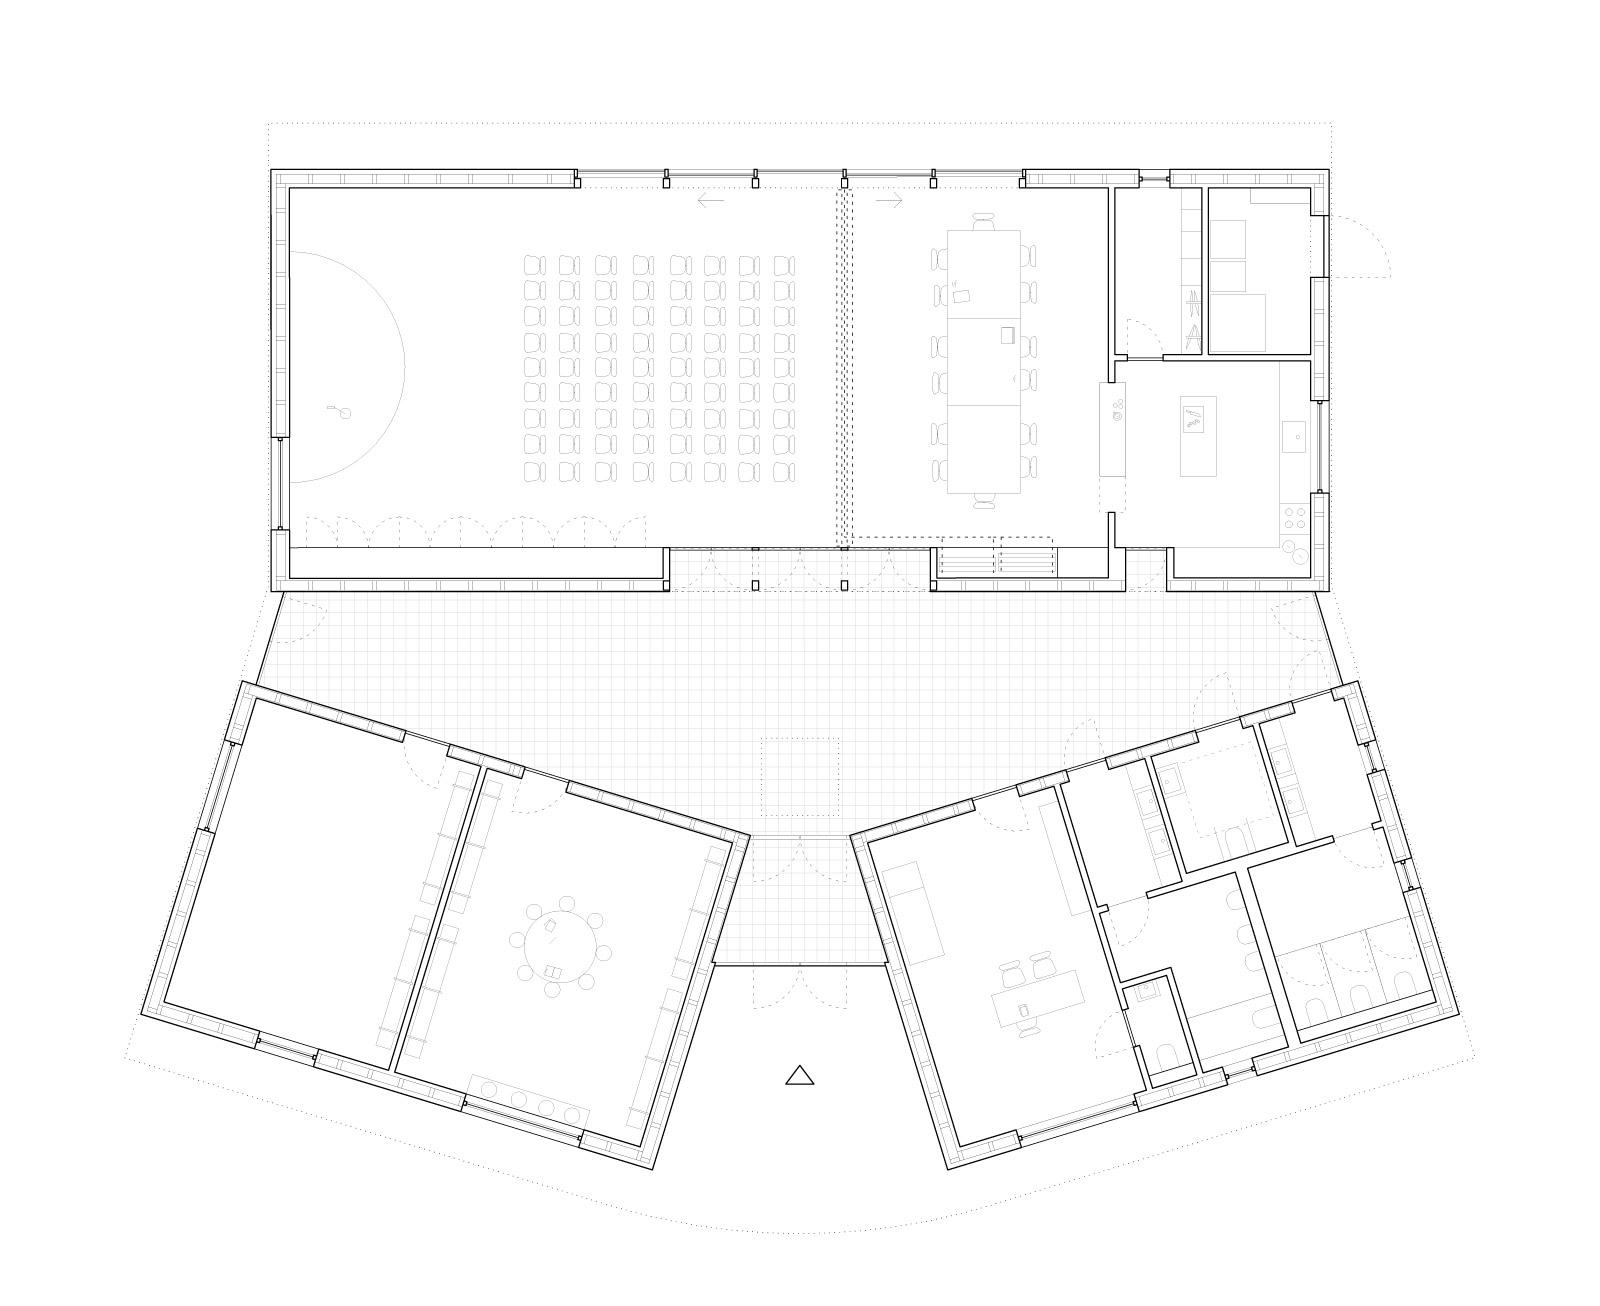 Atelier-Fanelsa-8-Groundfloor